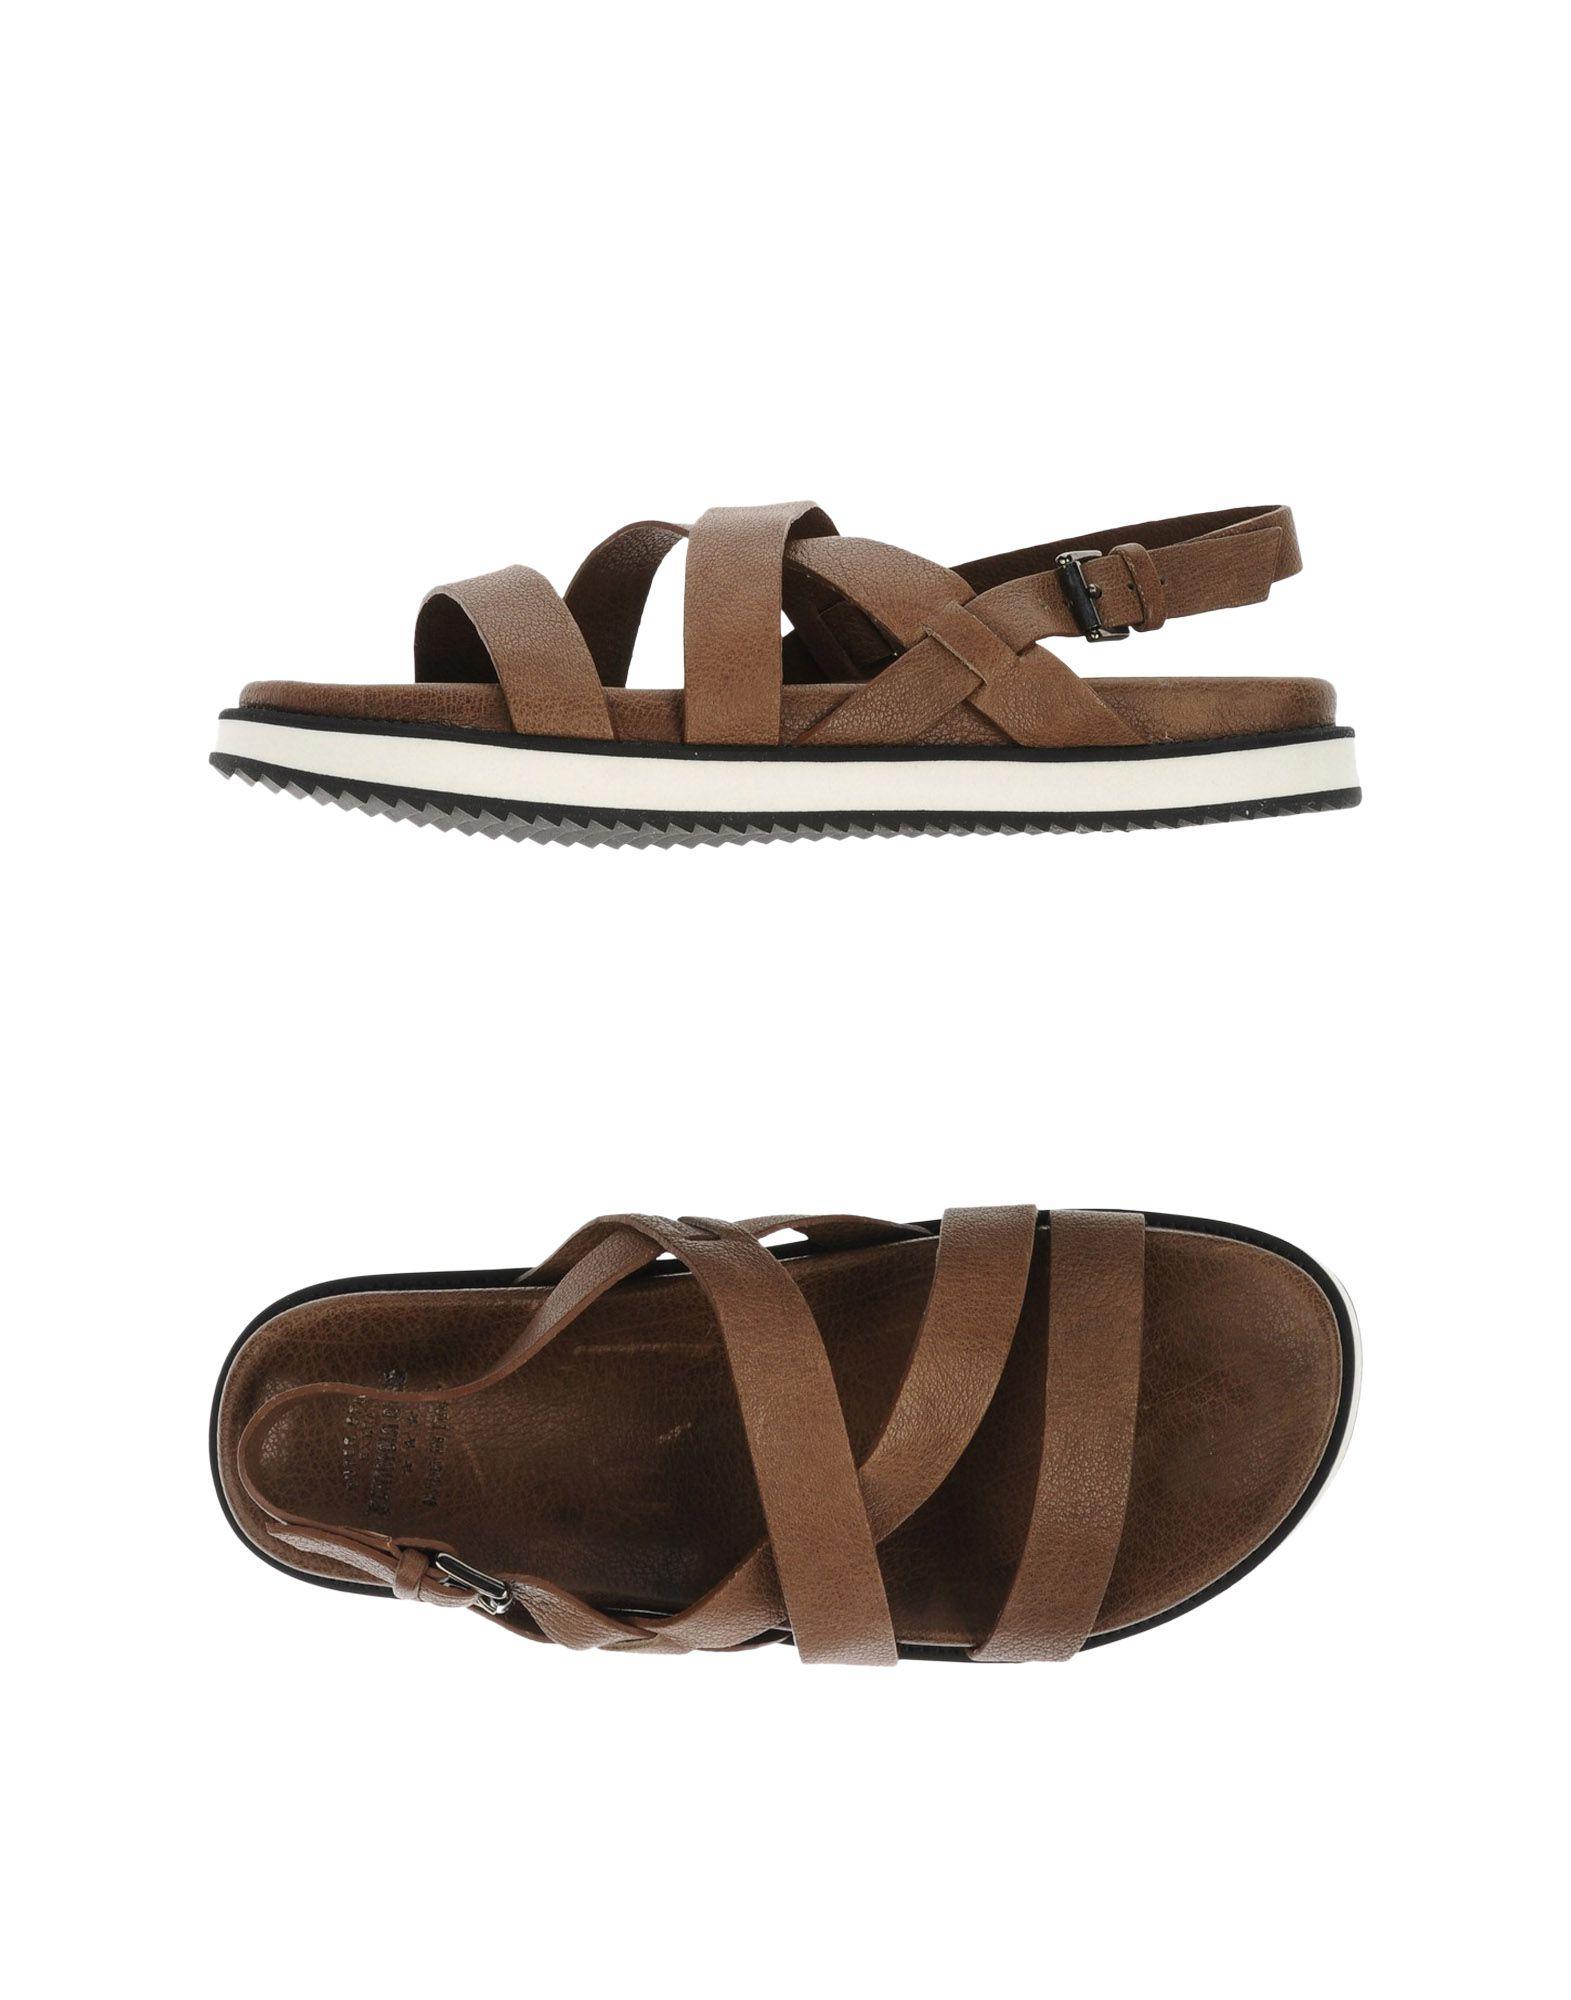 Pantofola D'oro Sandalen Damen  44915356EJGut aussehende strapazierfähige Schuhe